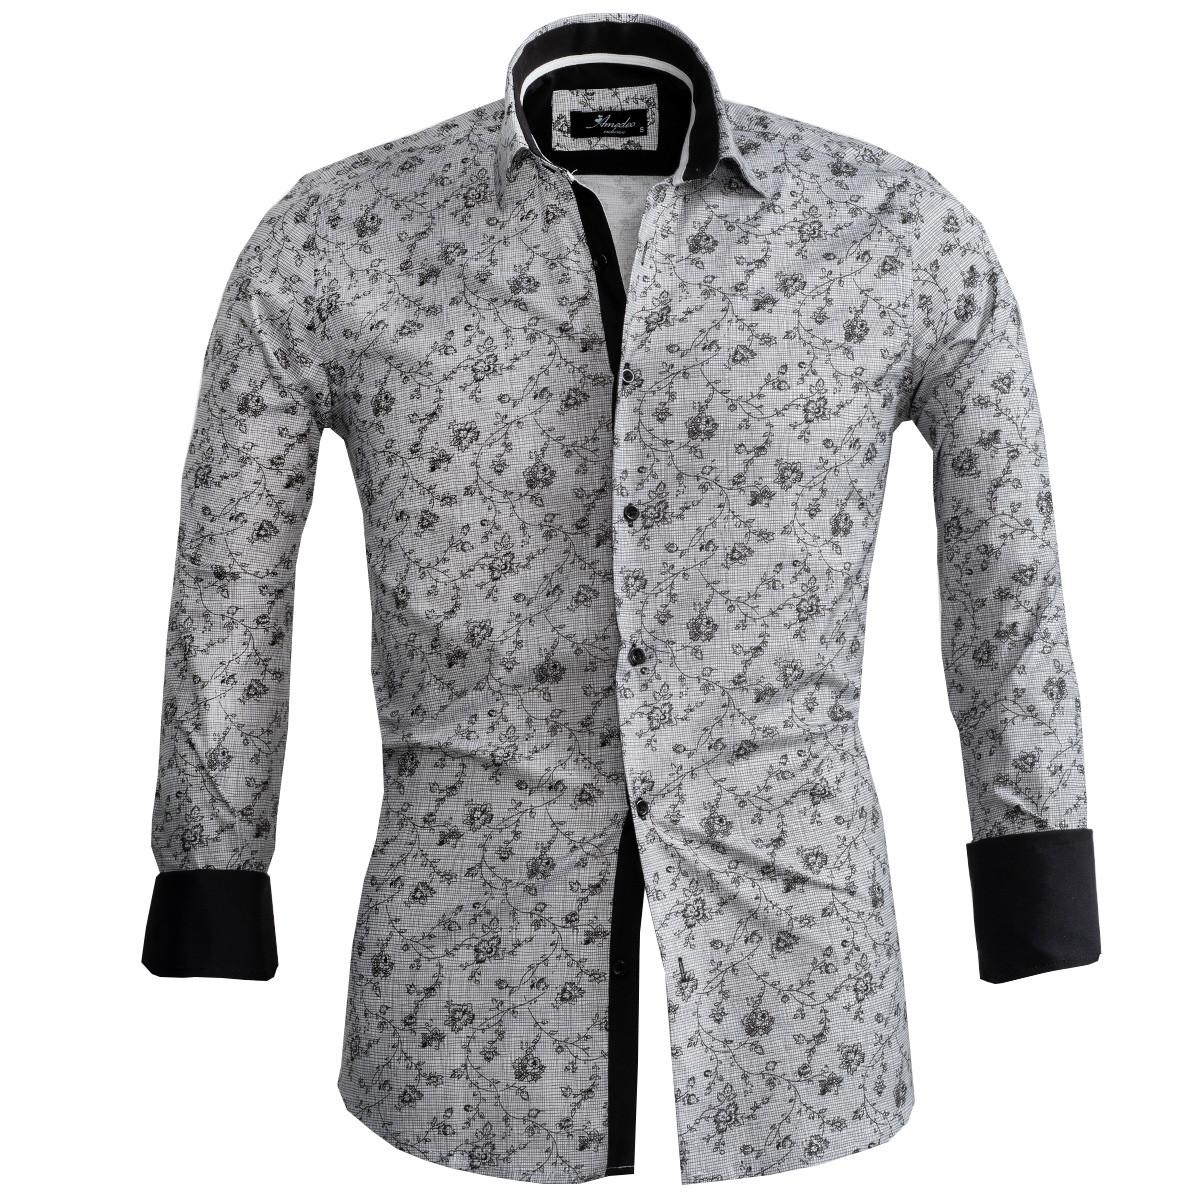 European Made & Designed Reversible Cuff Premium French Cuff Dress Shirt - grey & black